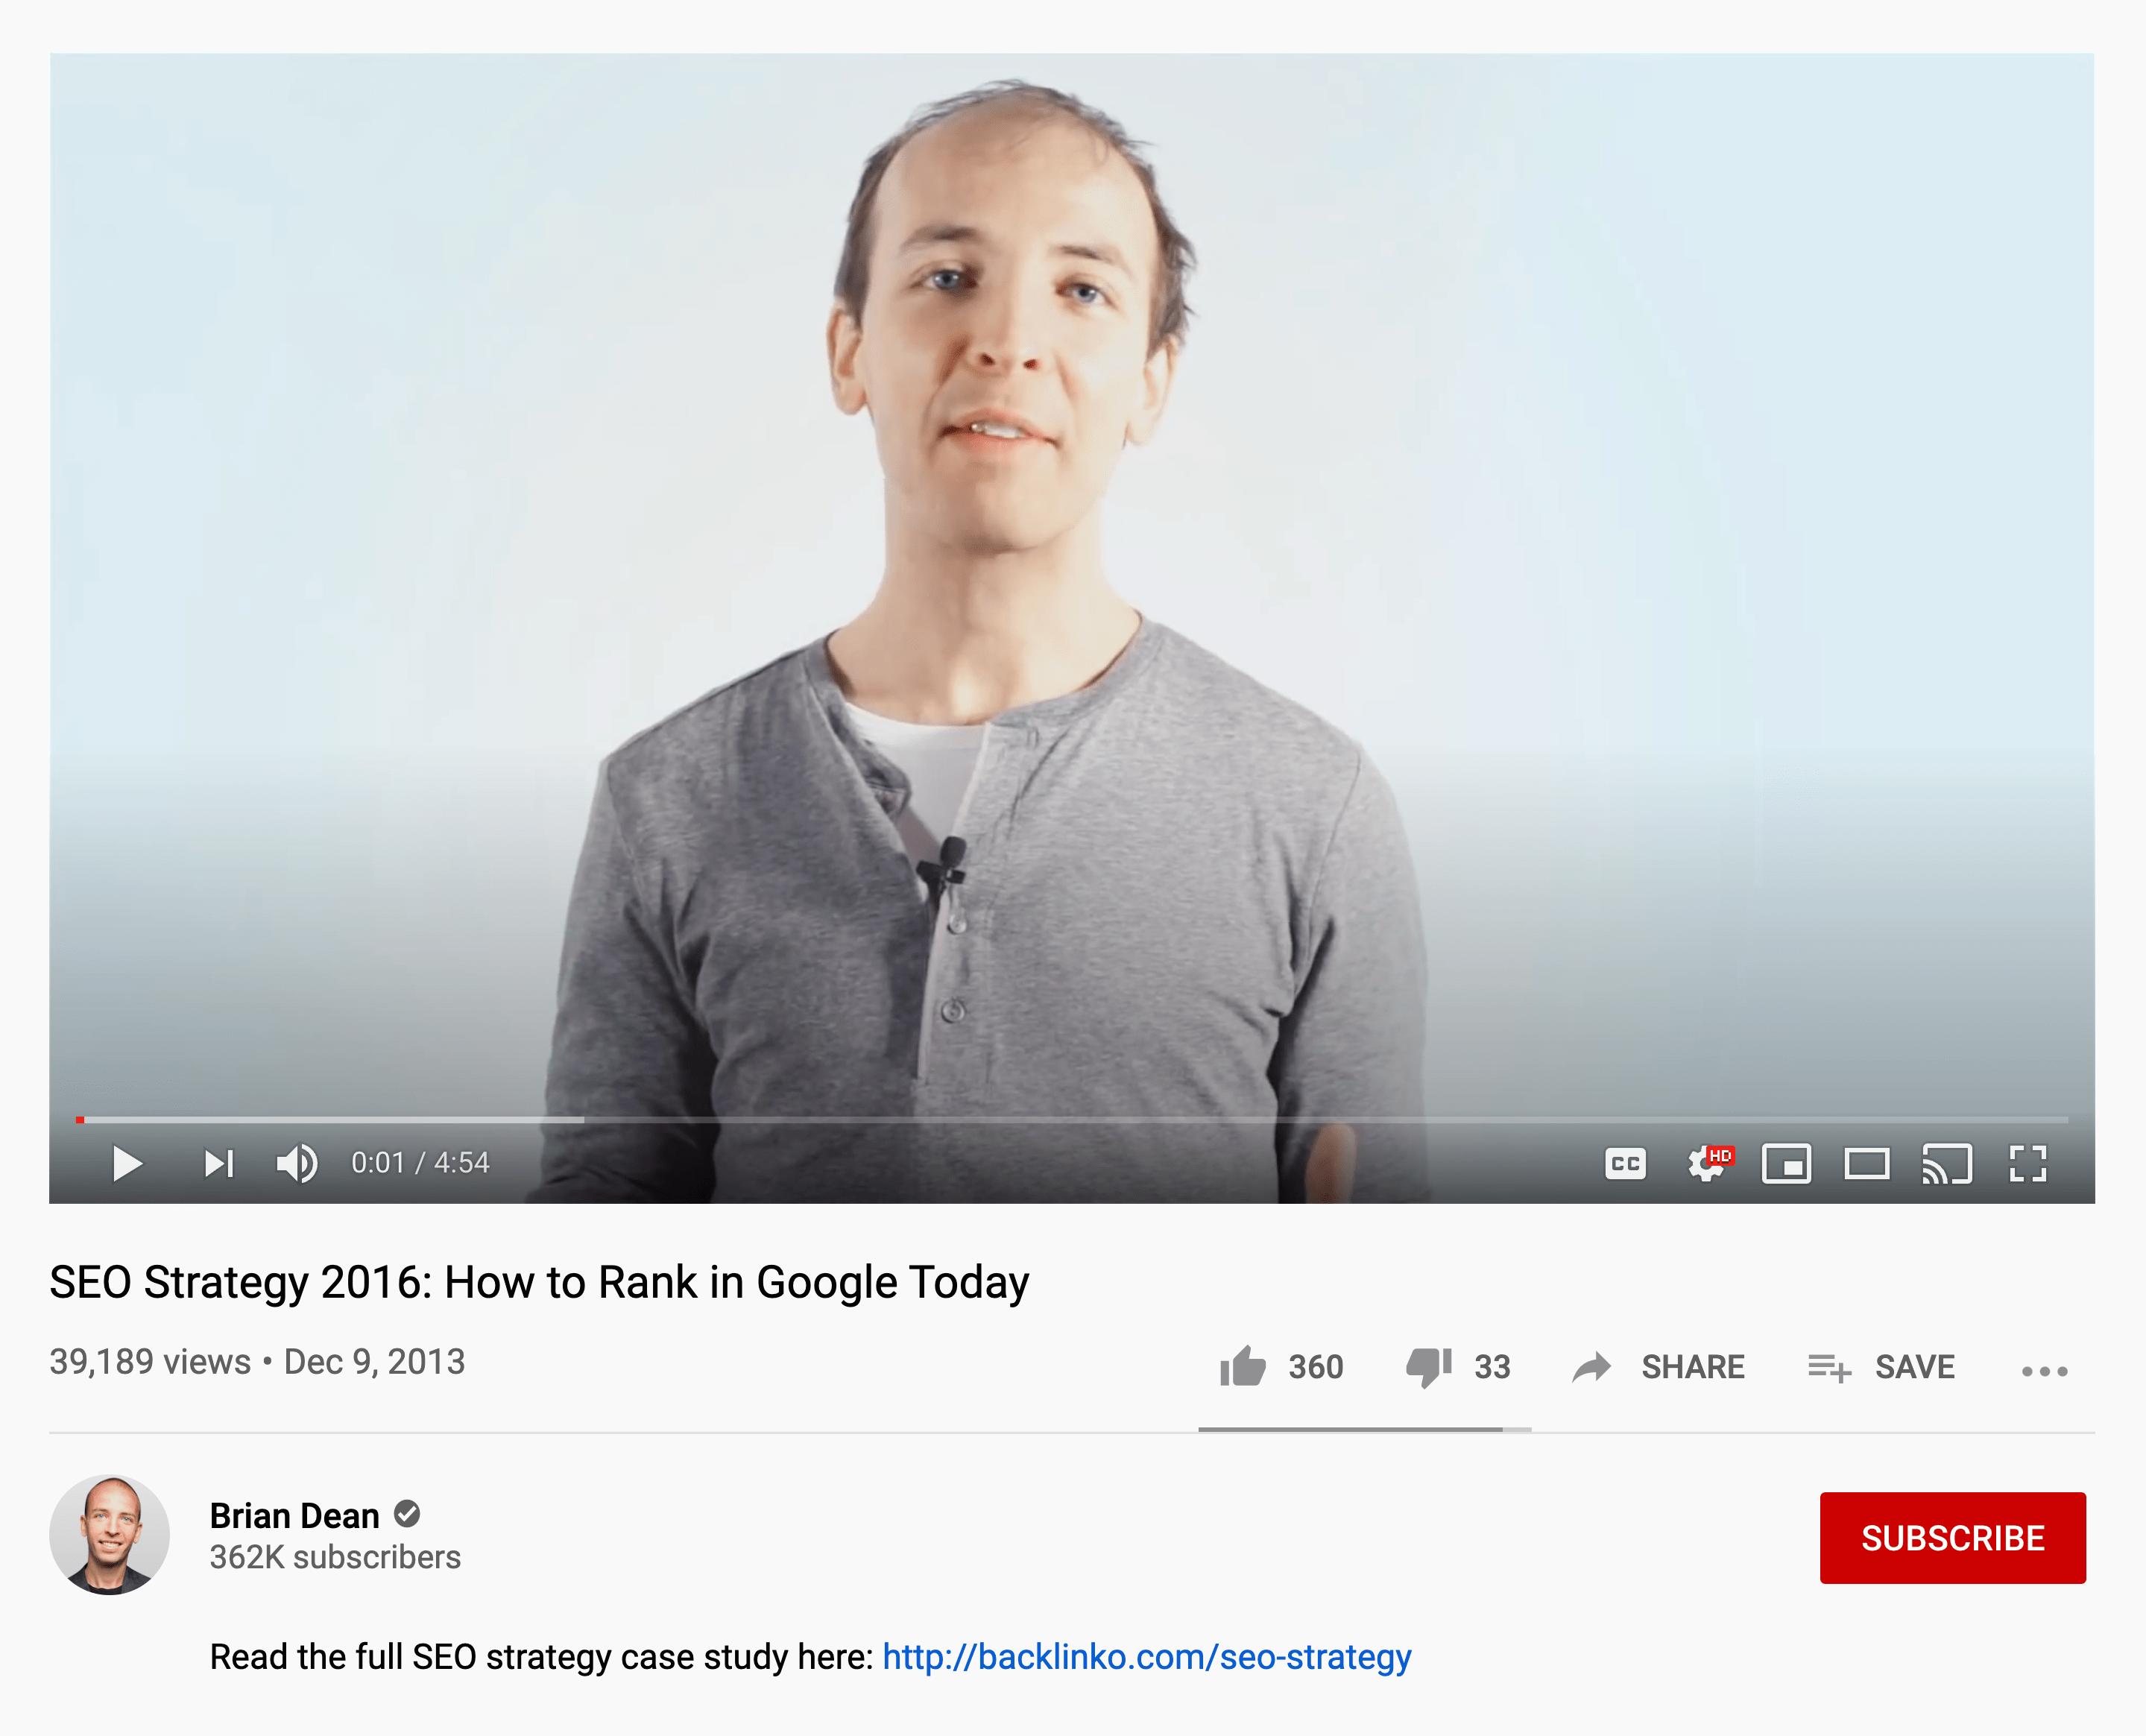 SEO Strategy 2016 – YouTube Video